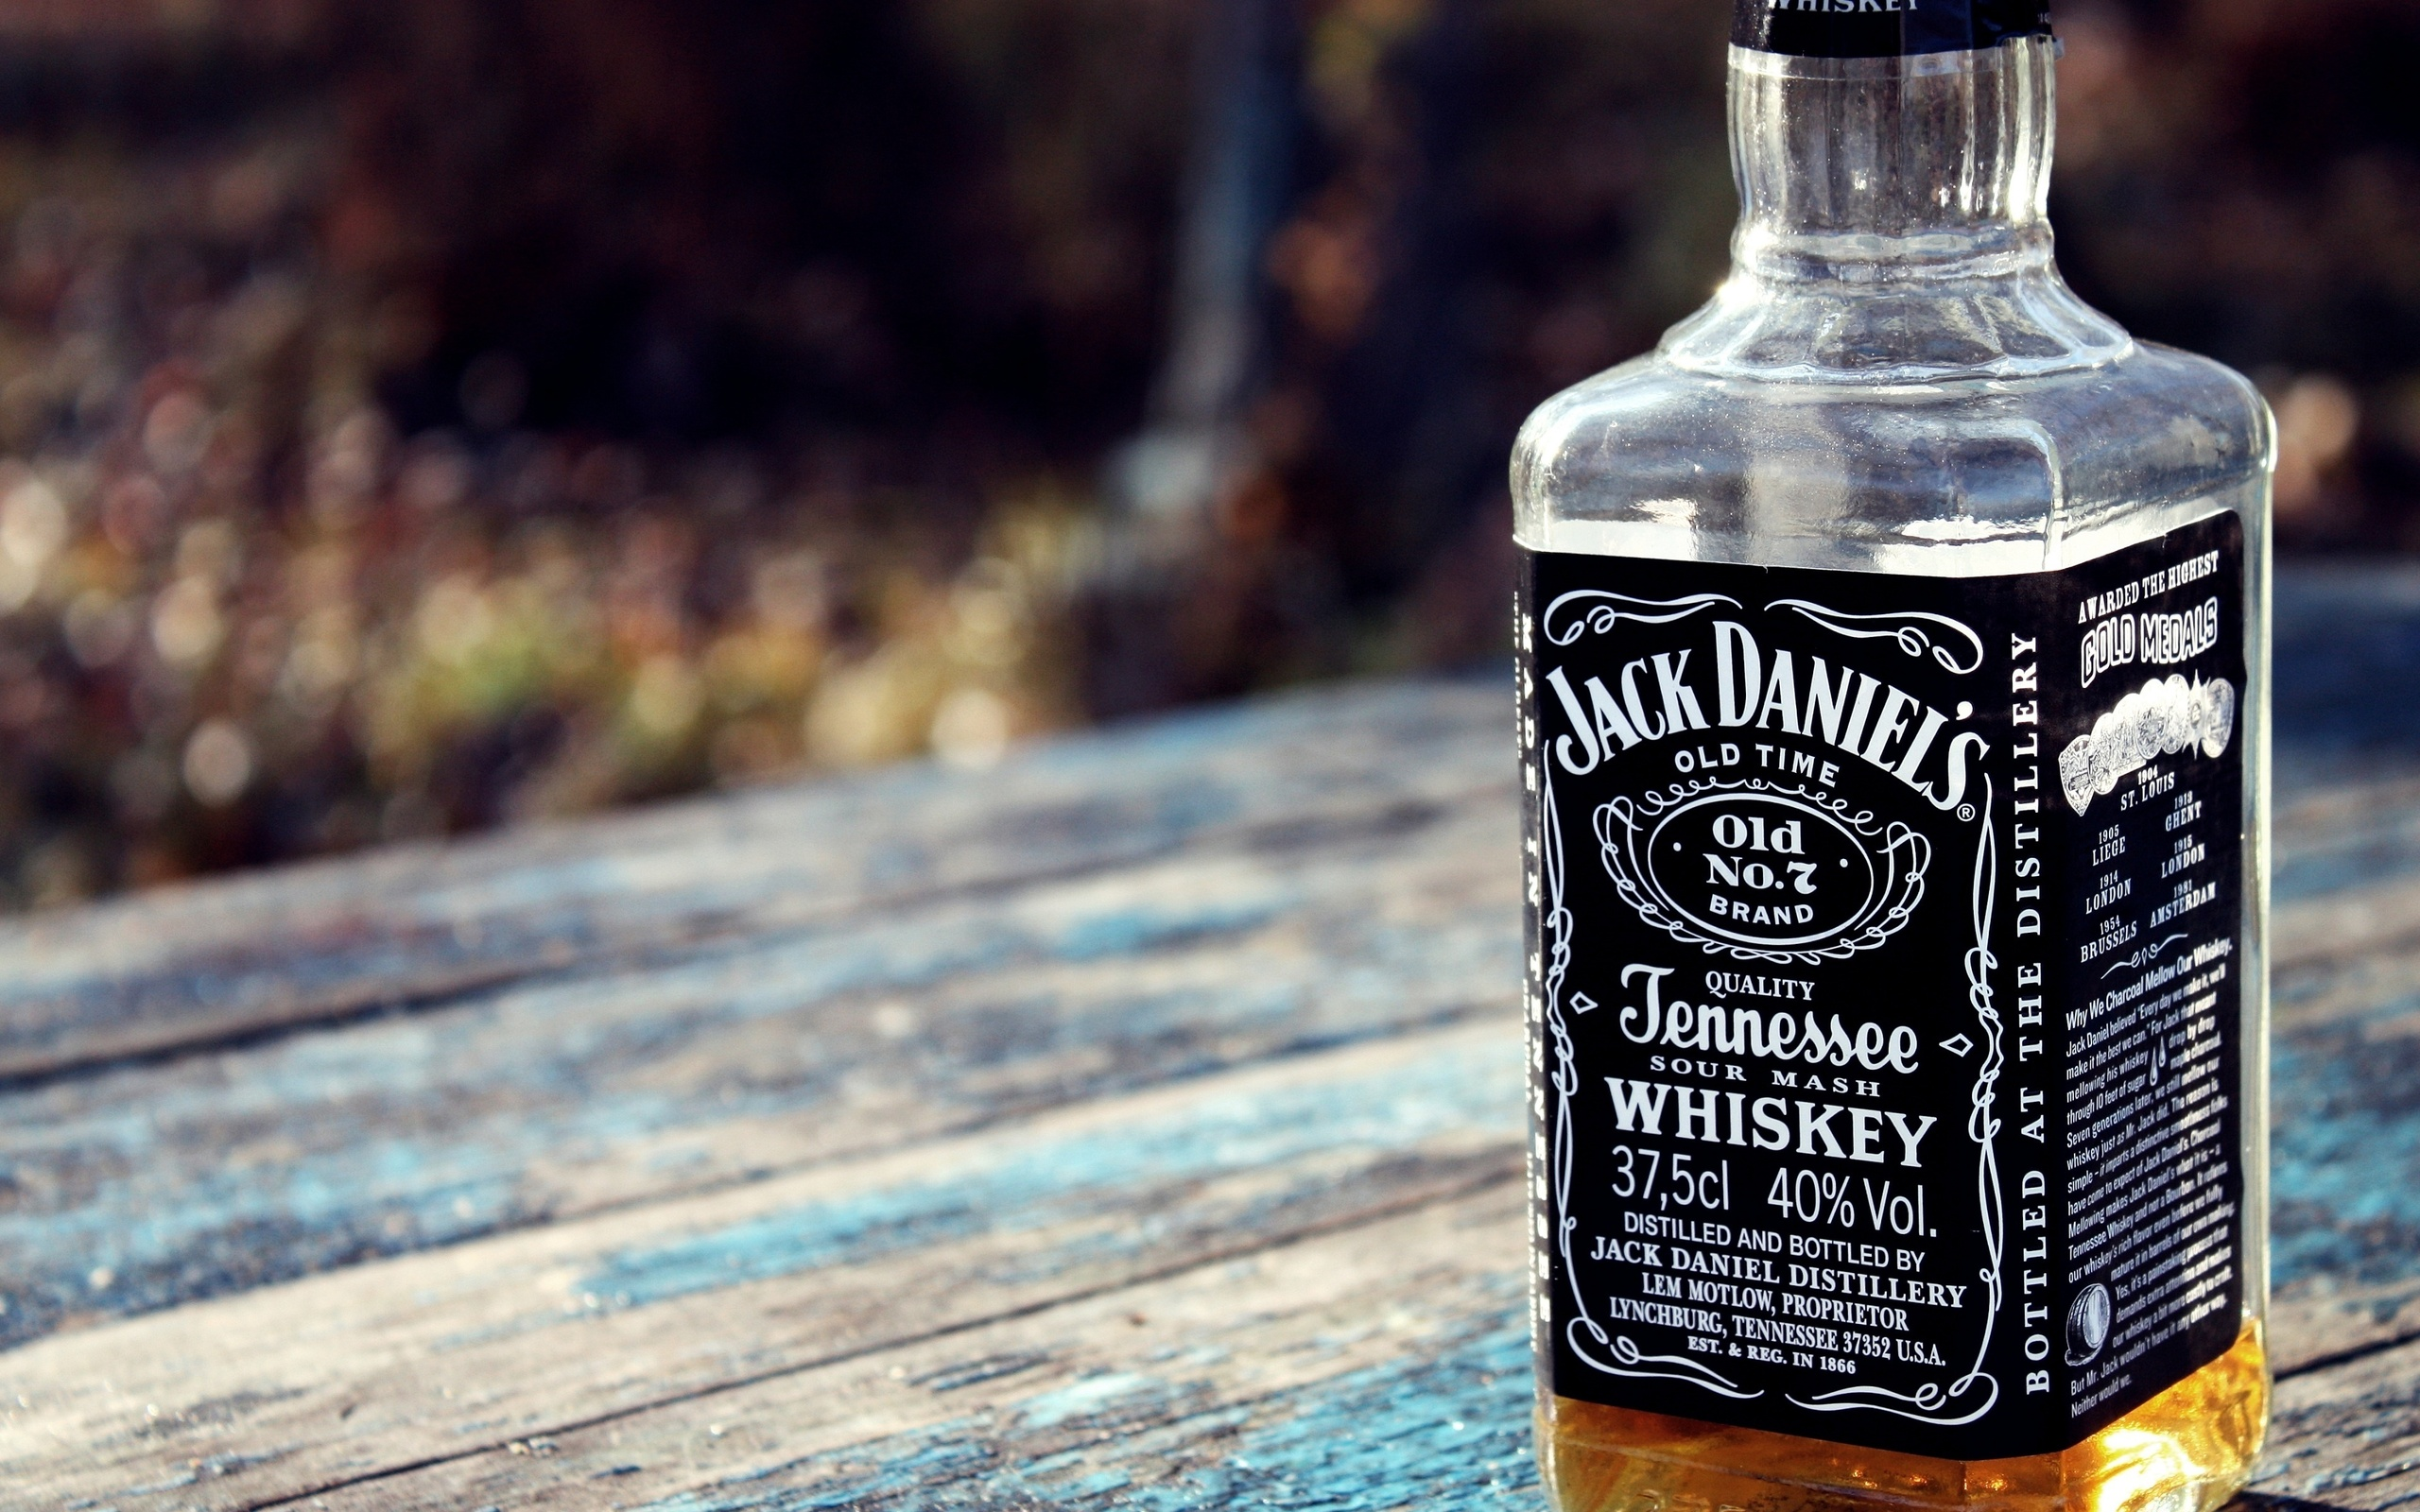 Jack daniels full hd wallpaper and background image 2560x1600 id products jack daniels wallpaper voltagebd Images